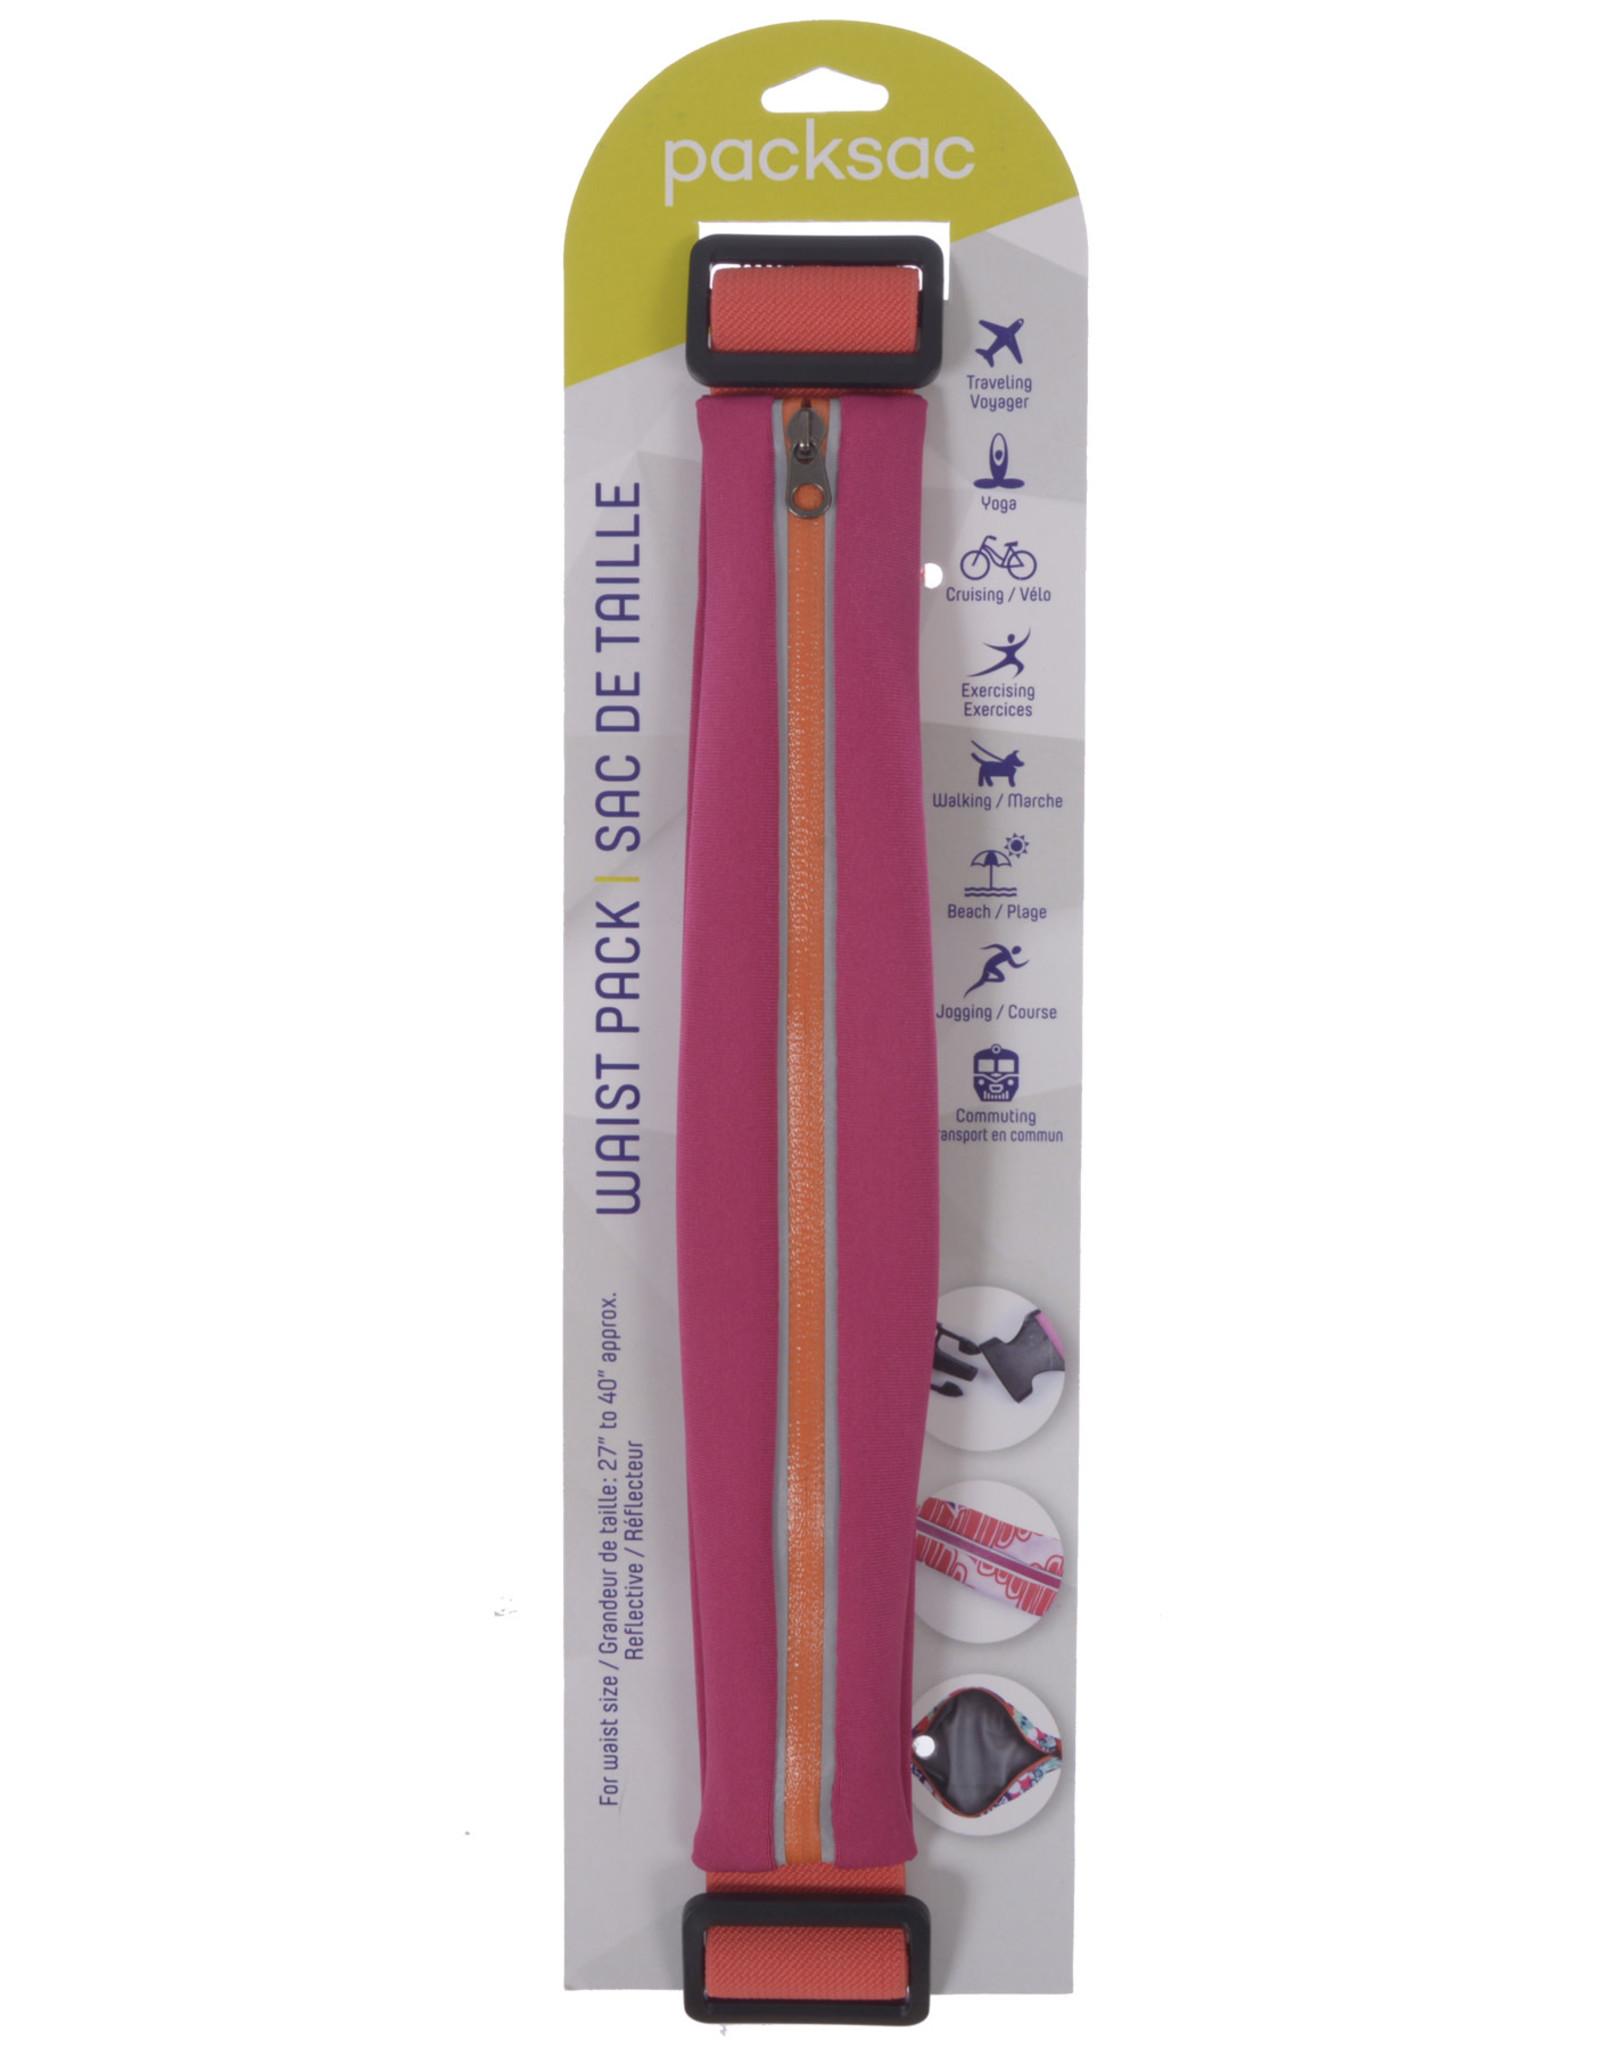 Vision Vogue Slim Waist pack - Pink